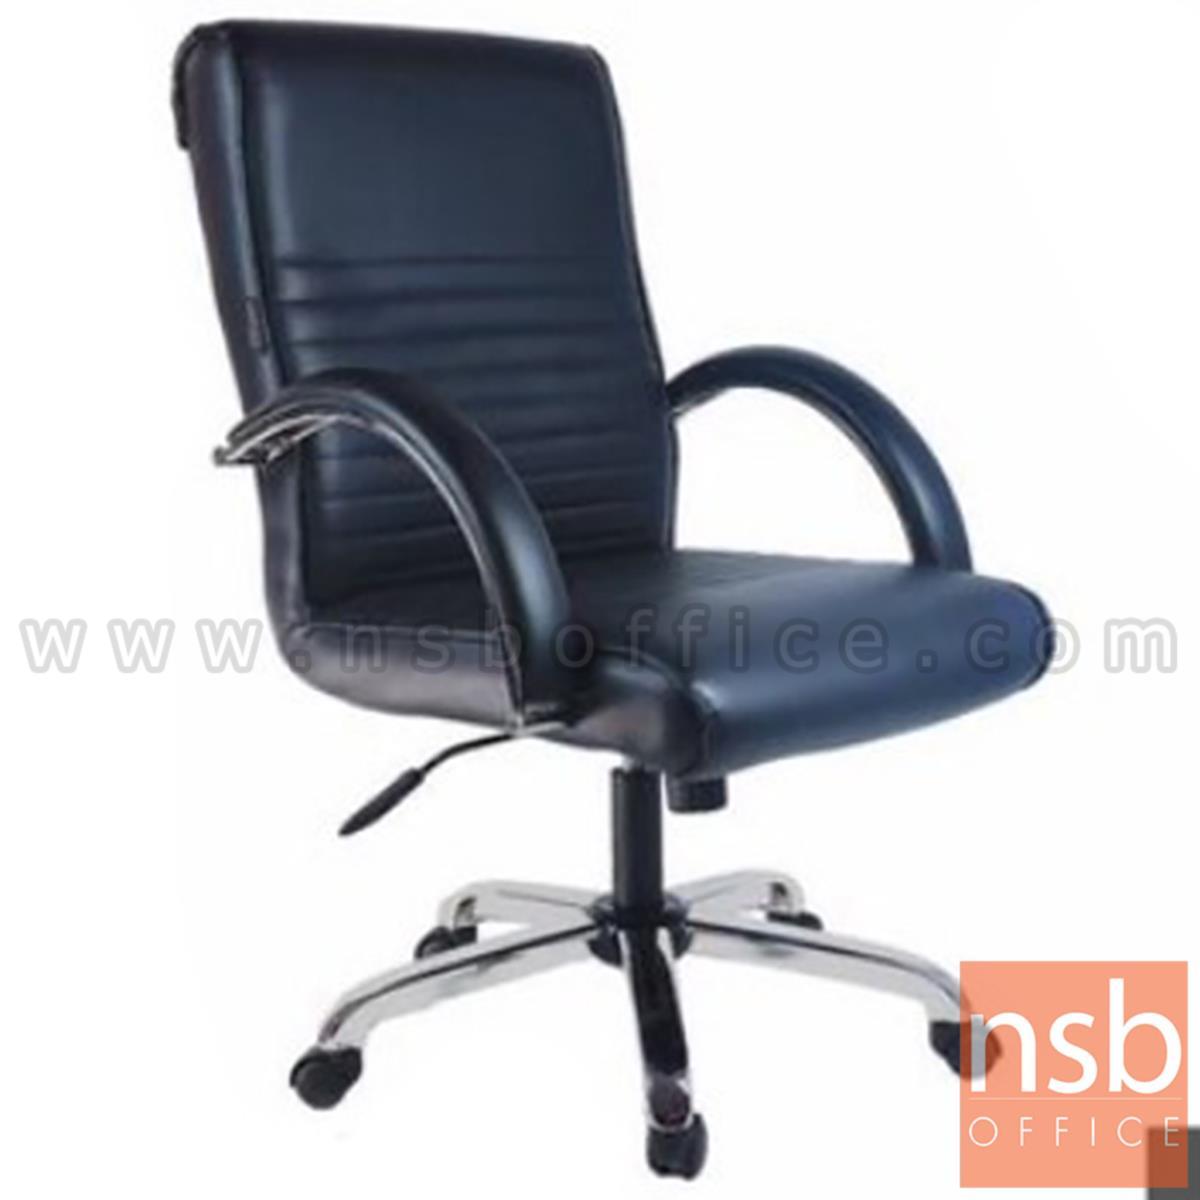 B26A138:เก้าอี้สำนักงาน รุ่น Calentha (คาเรนธ่า)  โช๊คแก๊ส มีก้อนโยก ขาพลาสติก